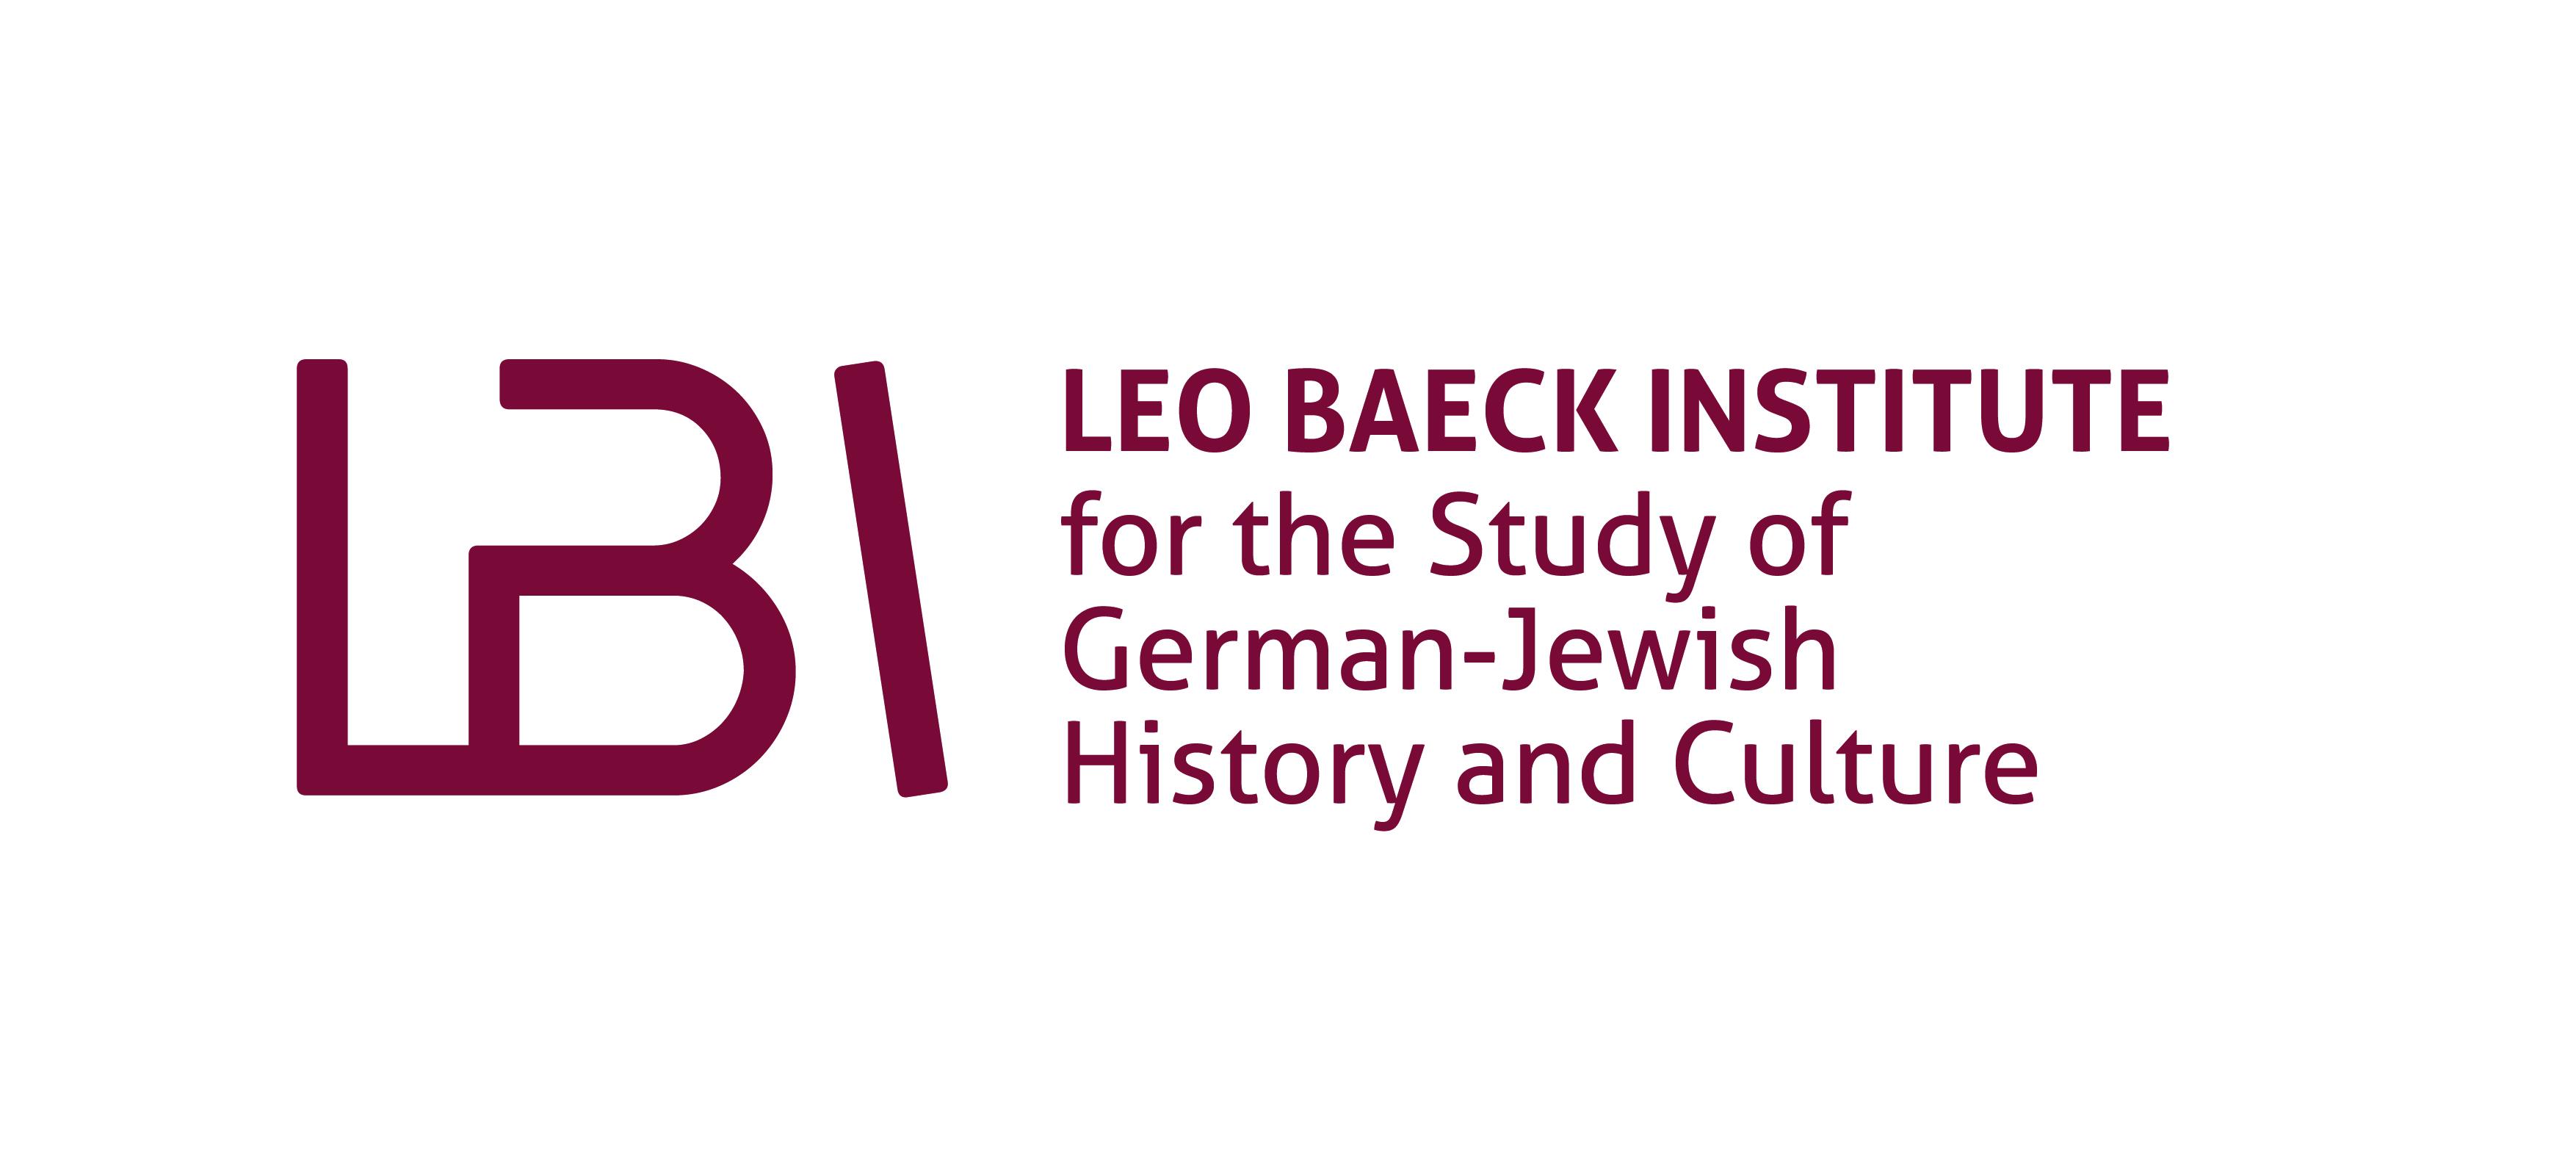 Leo Baeck Institut Wikipedia